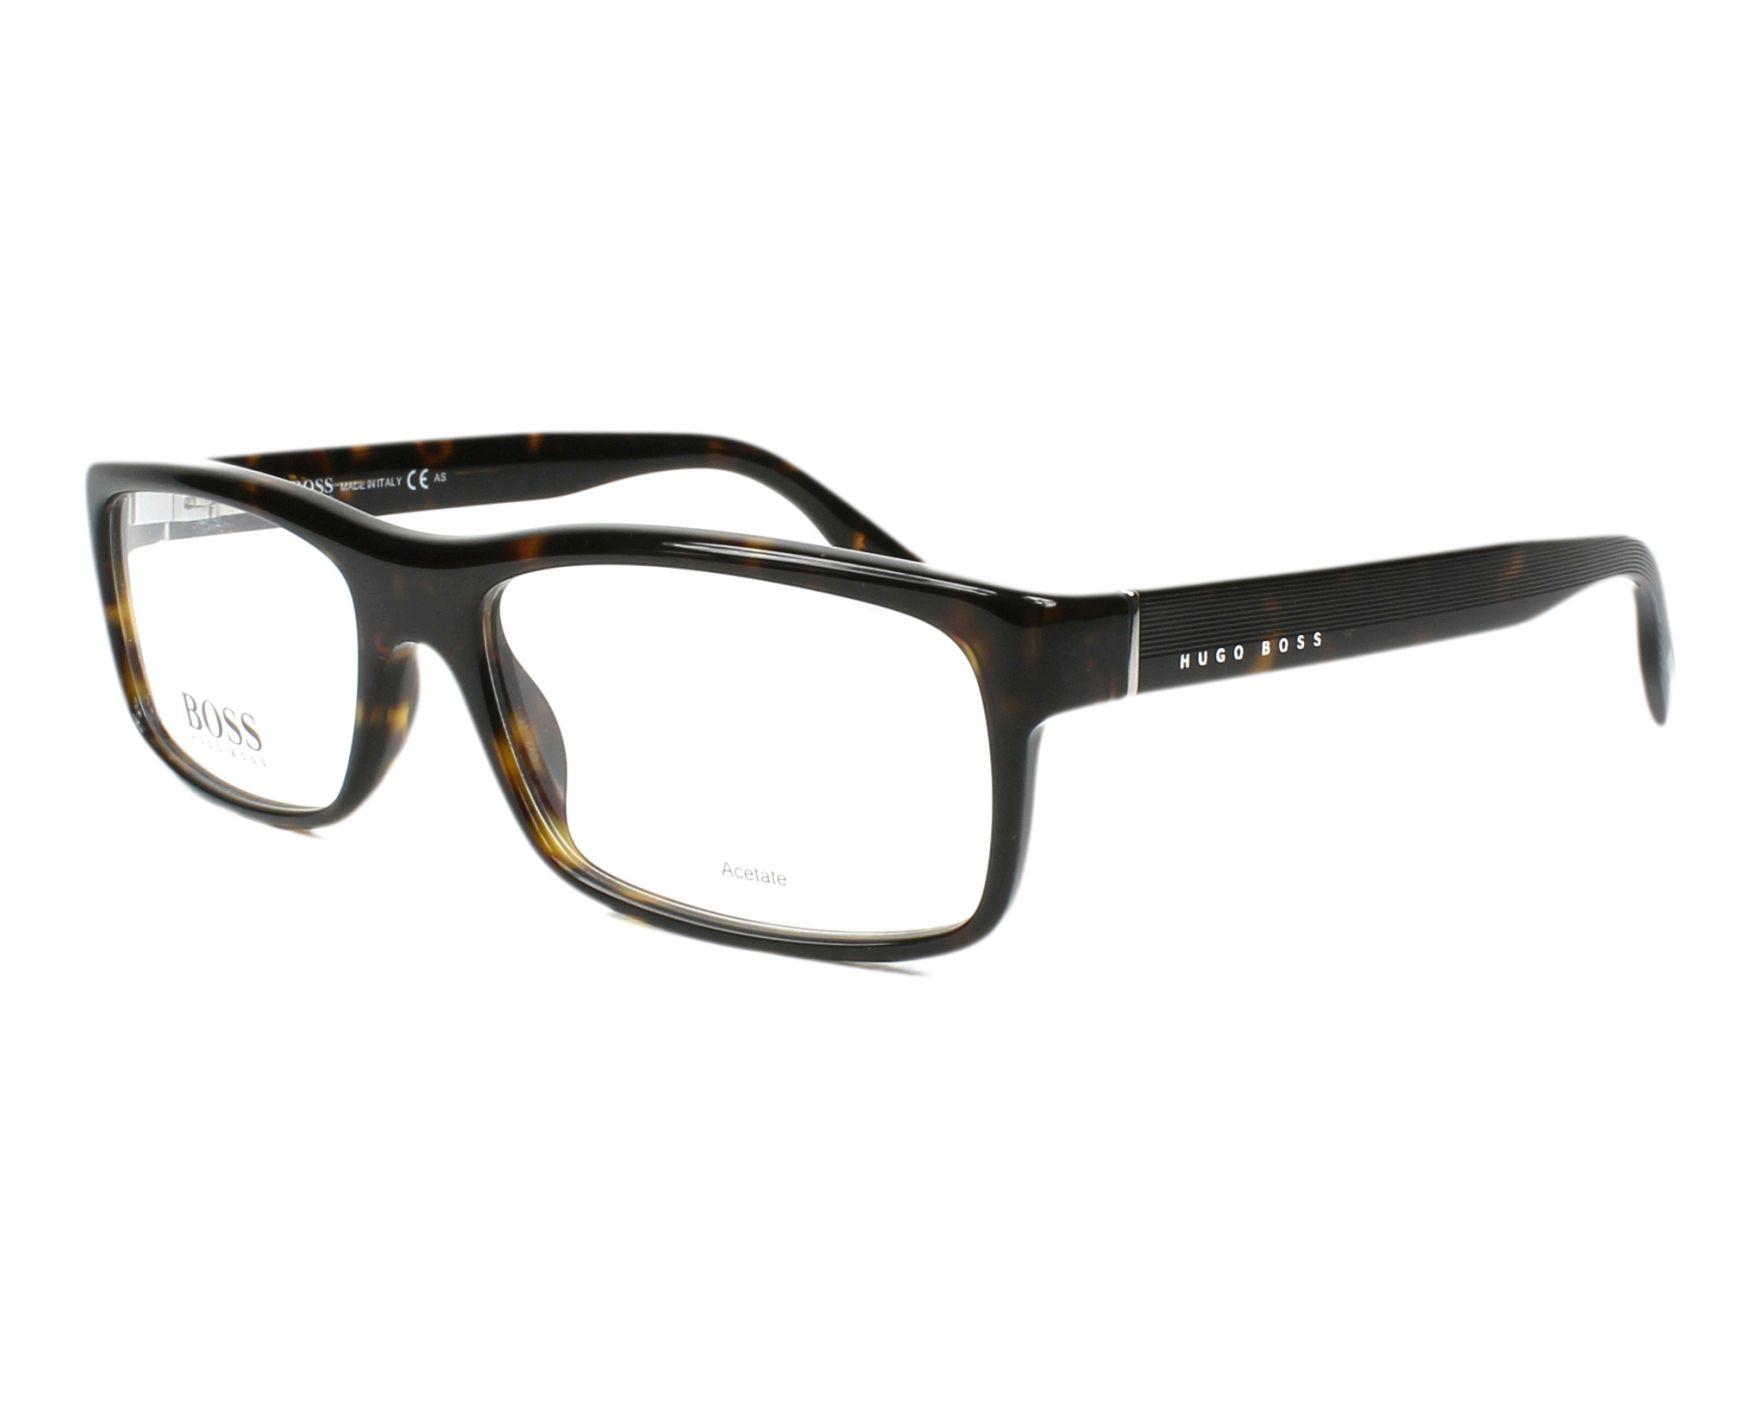 1ae27aebdbed6 eyeglasses Hugo Boss BOSS-0523 086 - Havana profile view